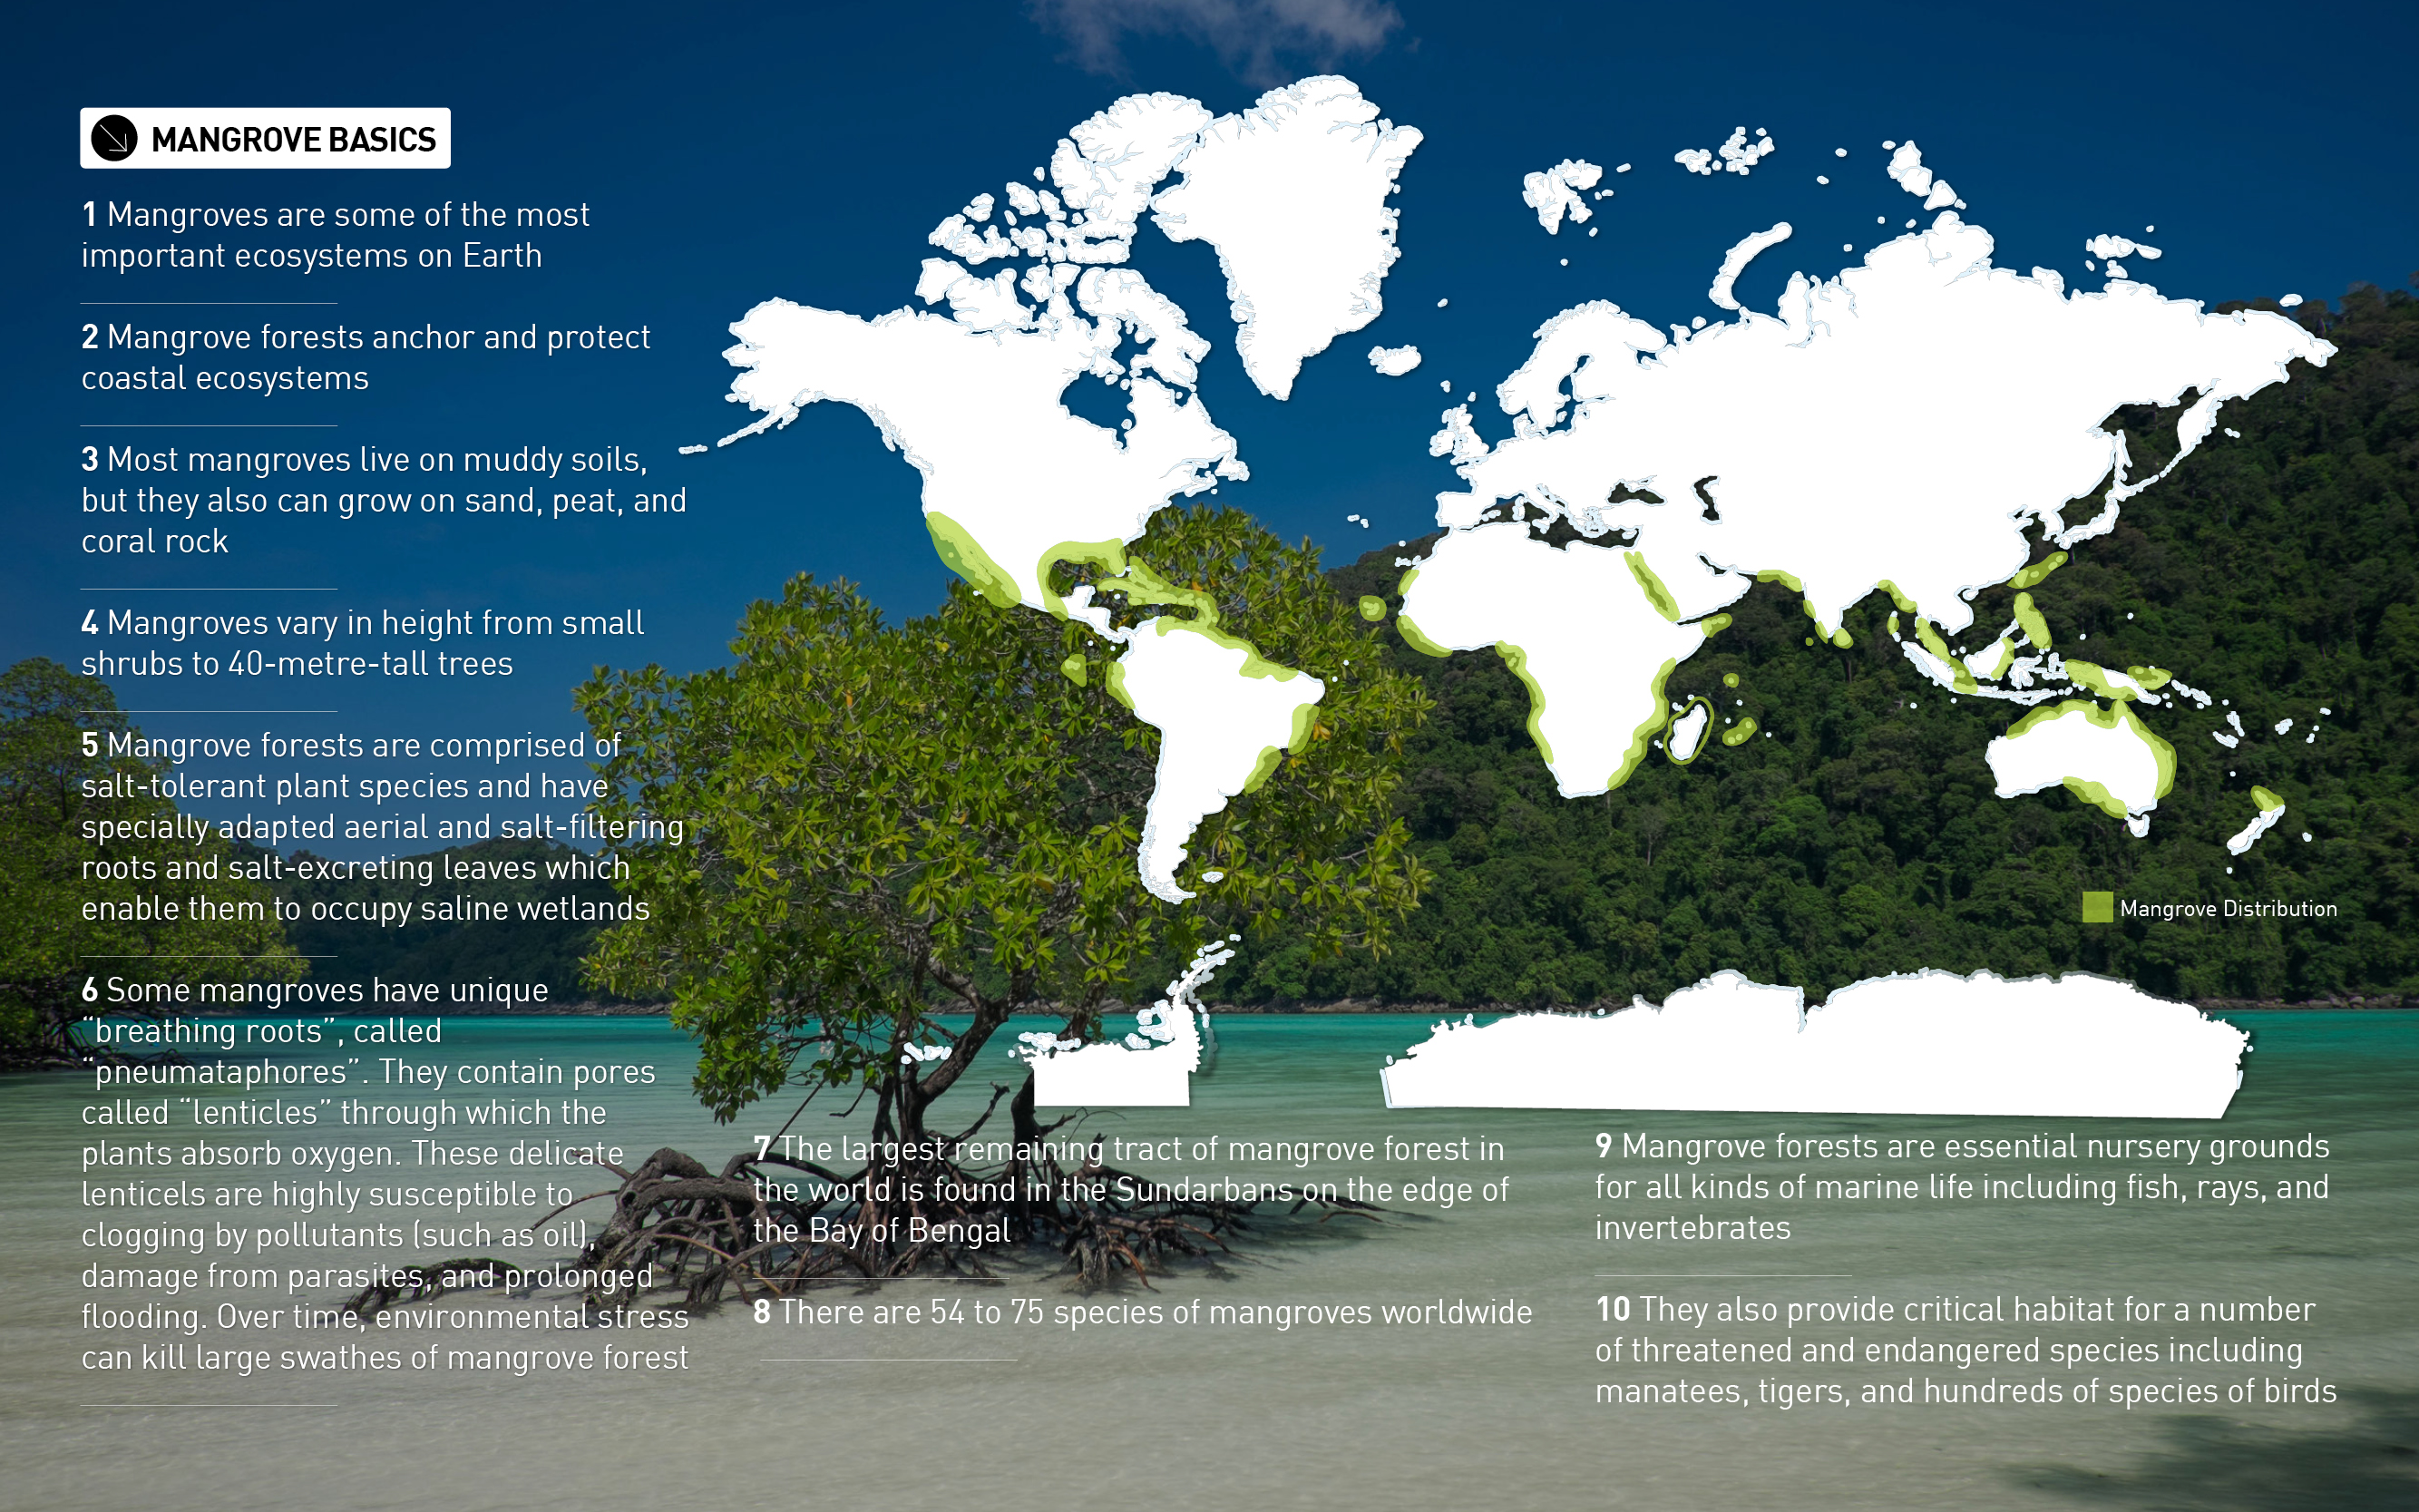 mangroves basics